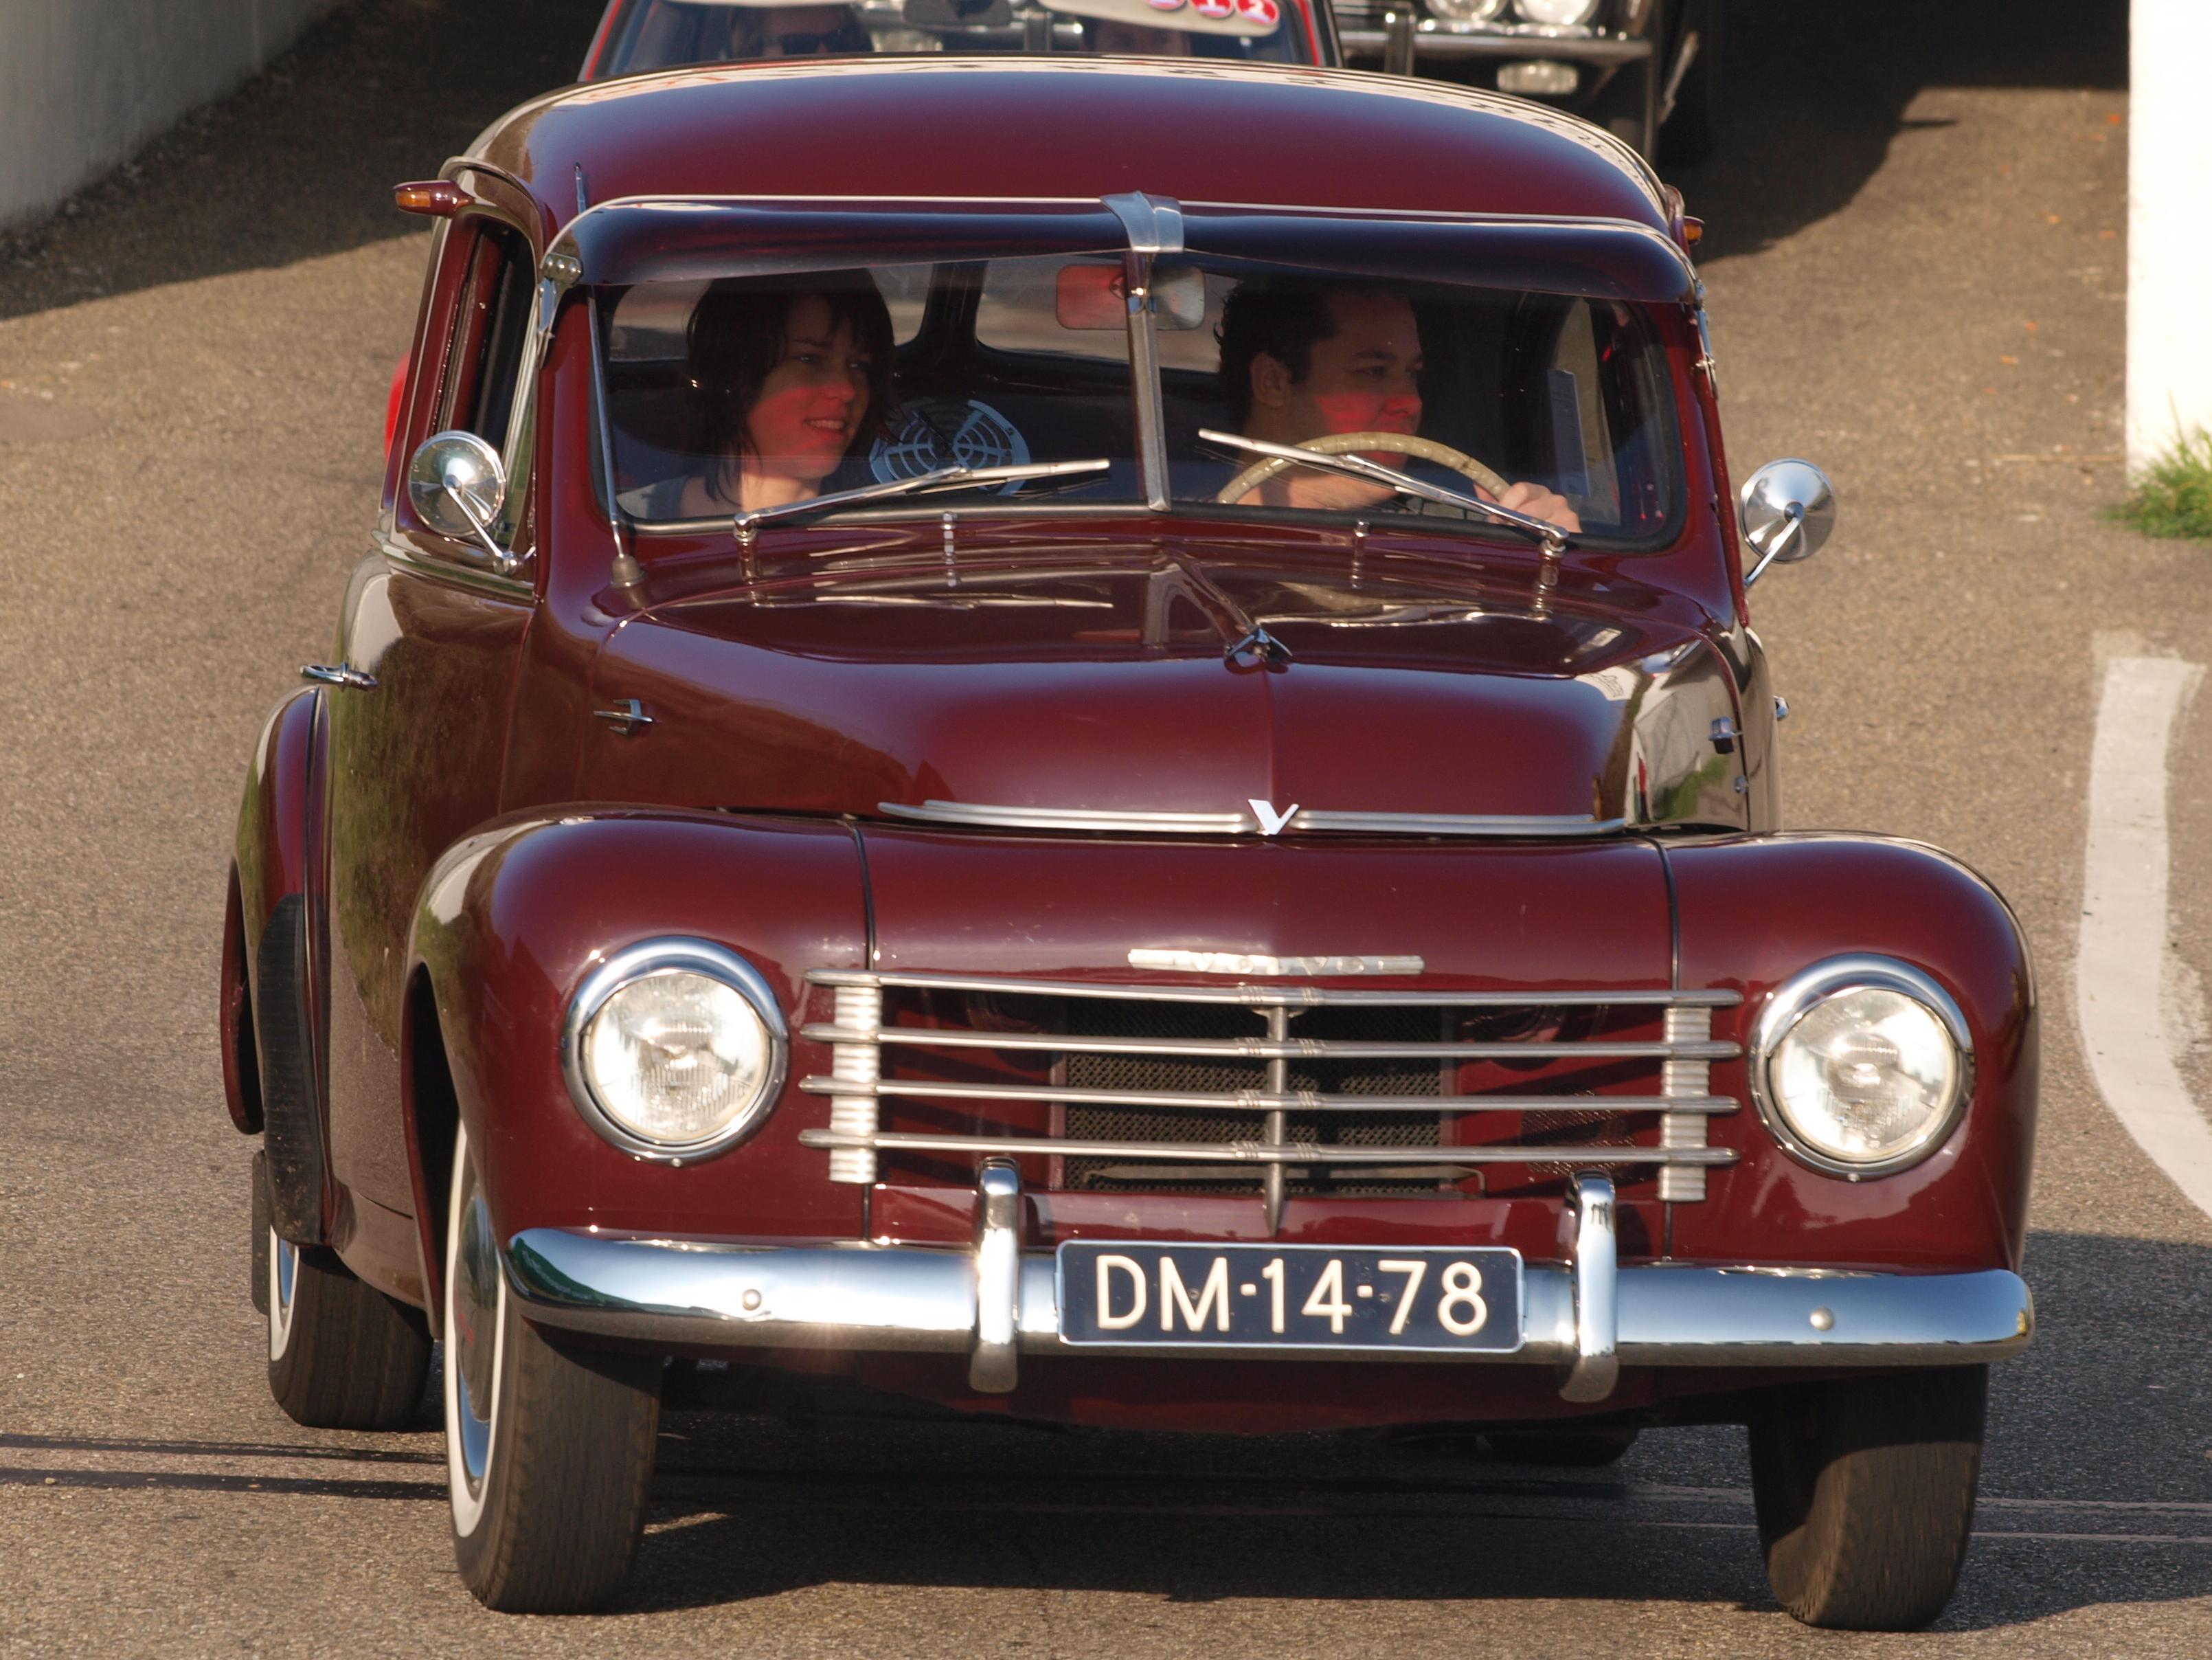 File:Volvo 444 dutch licence registration DM-14-78 pic2 JPG